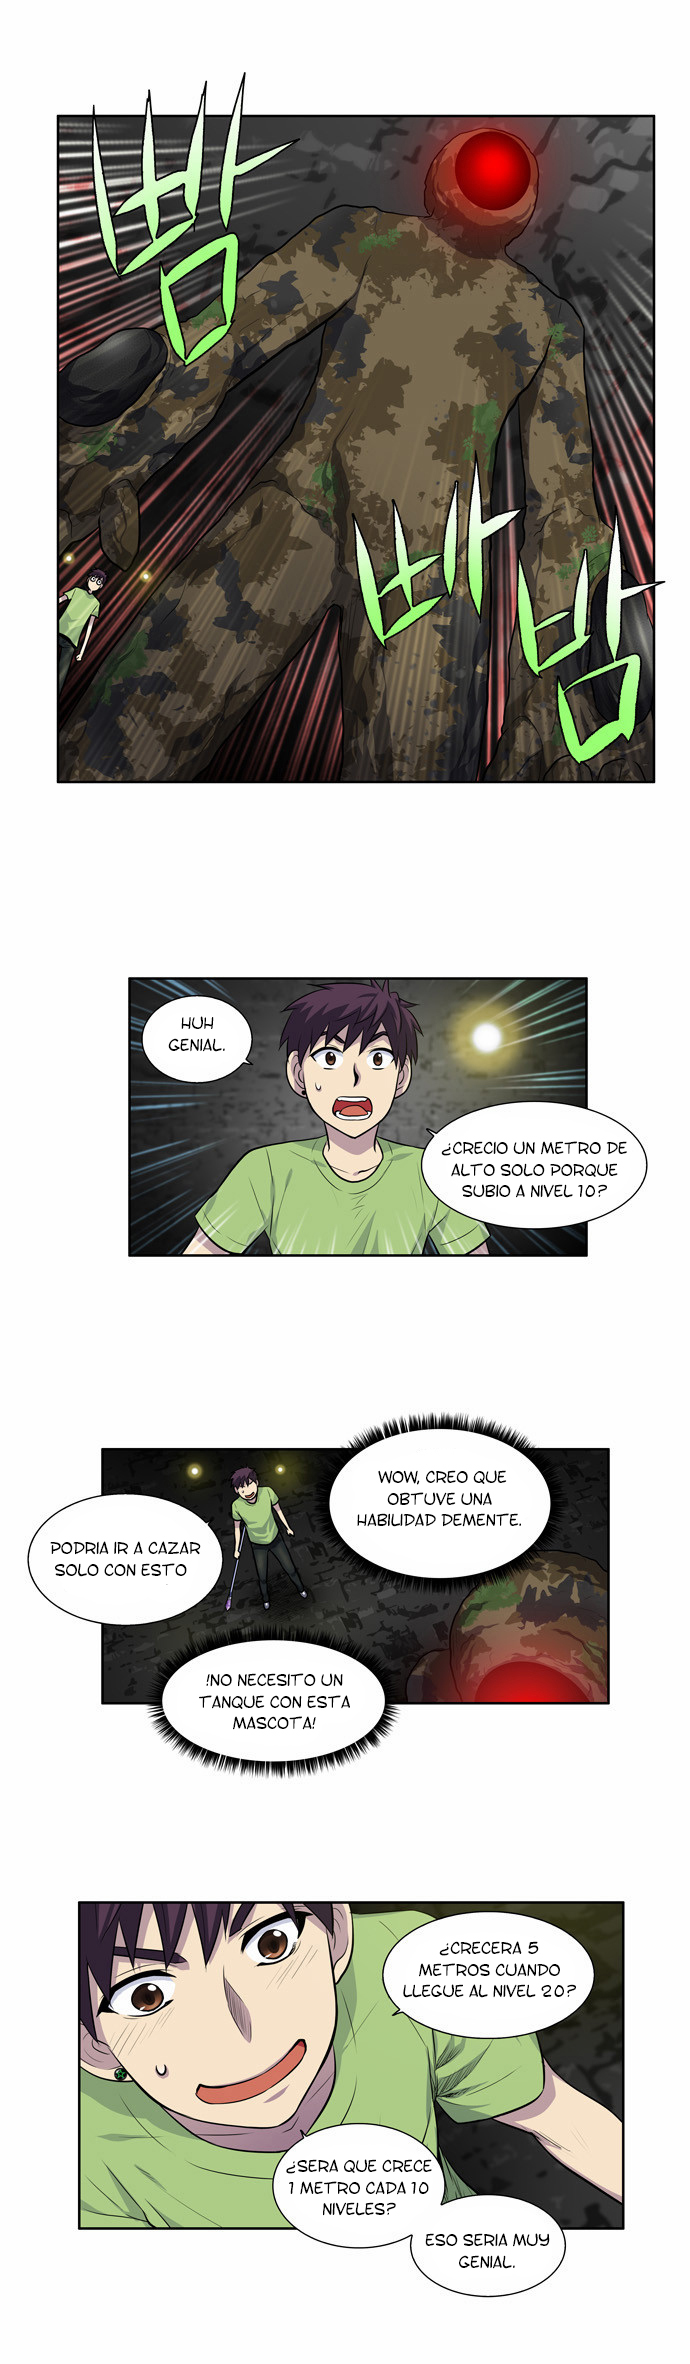 https://c5.ninemanga.com/es_manga/61/1725/420034/aa839cfb74f9e5ae2a89572a0093dd58.jpg Page 5